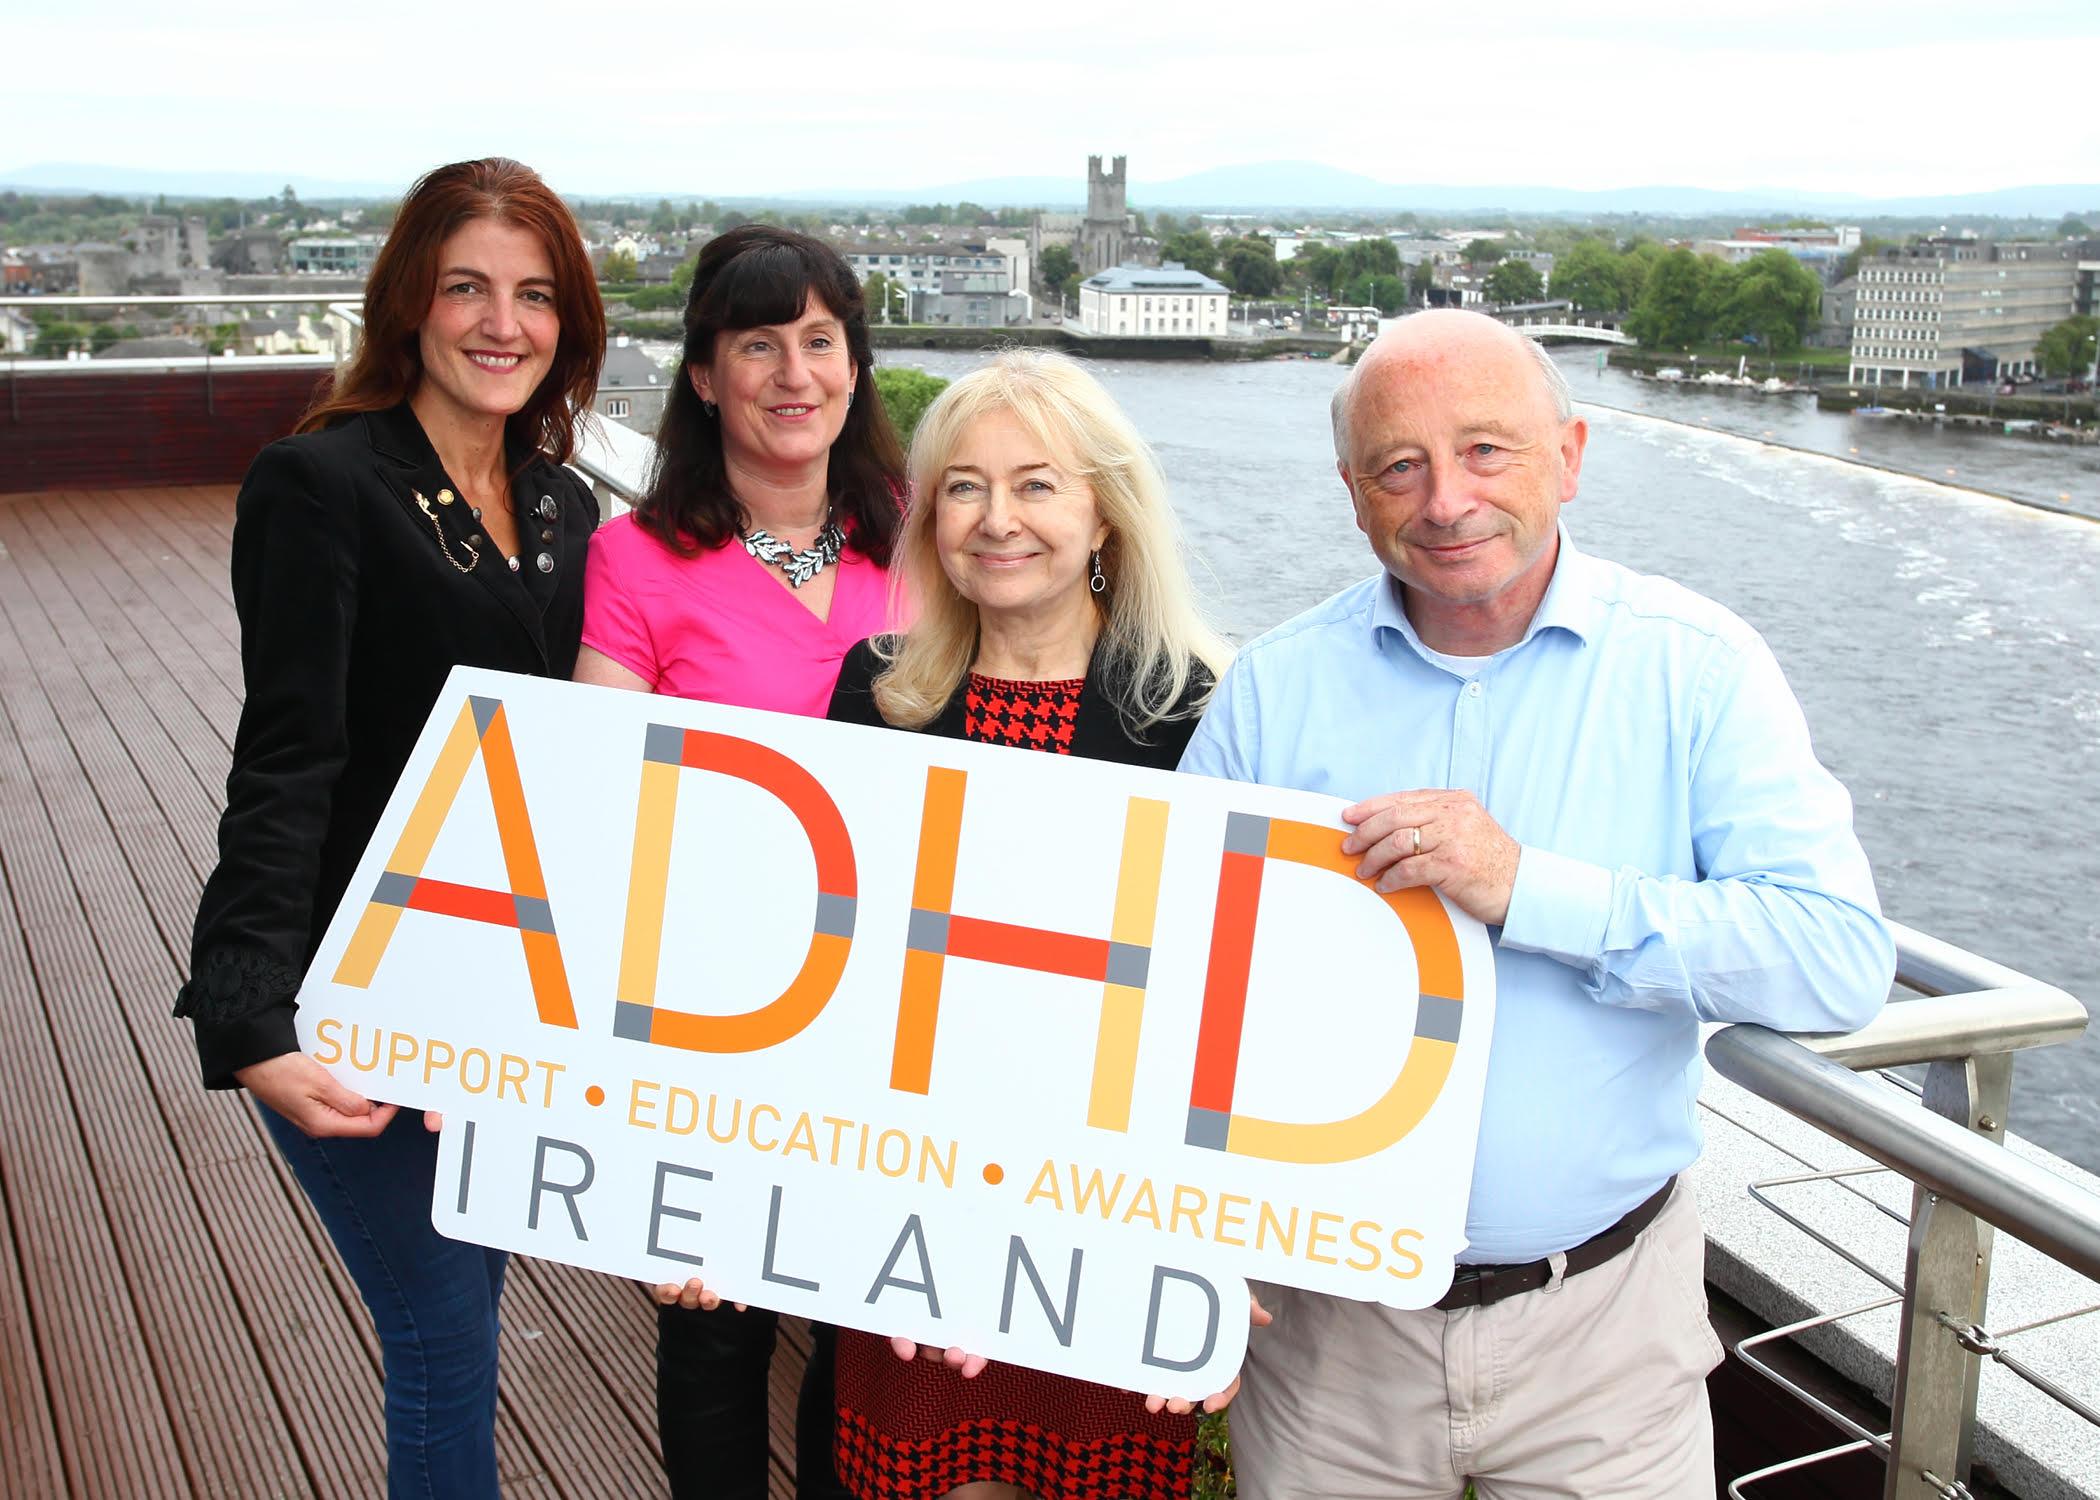 ADHD Ireland